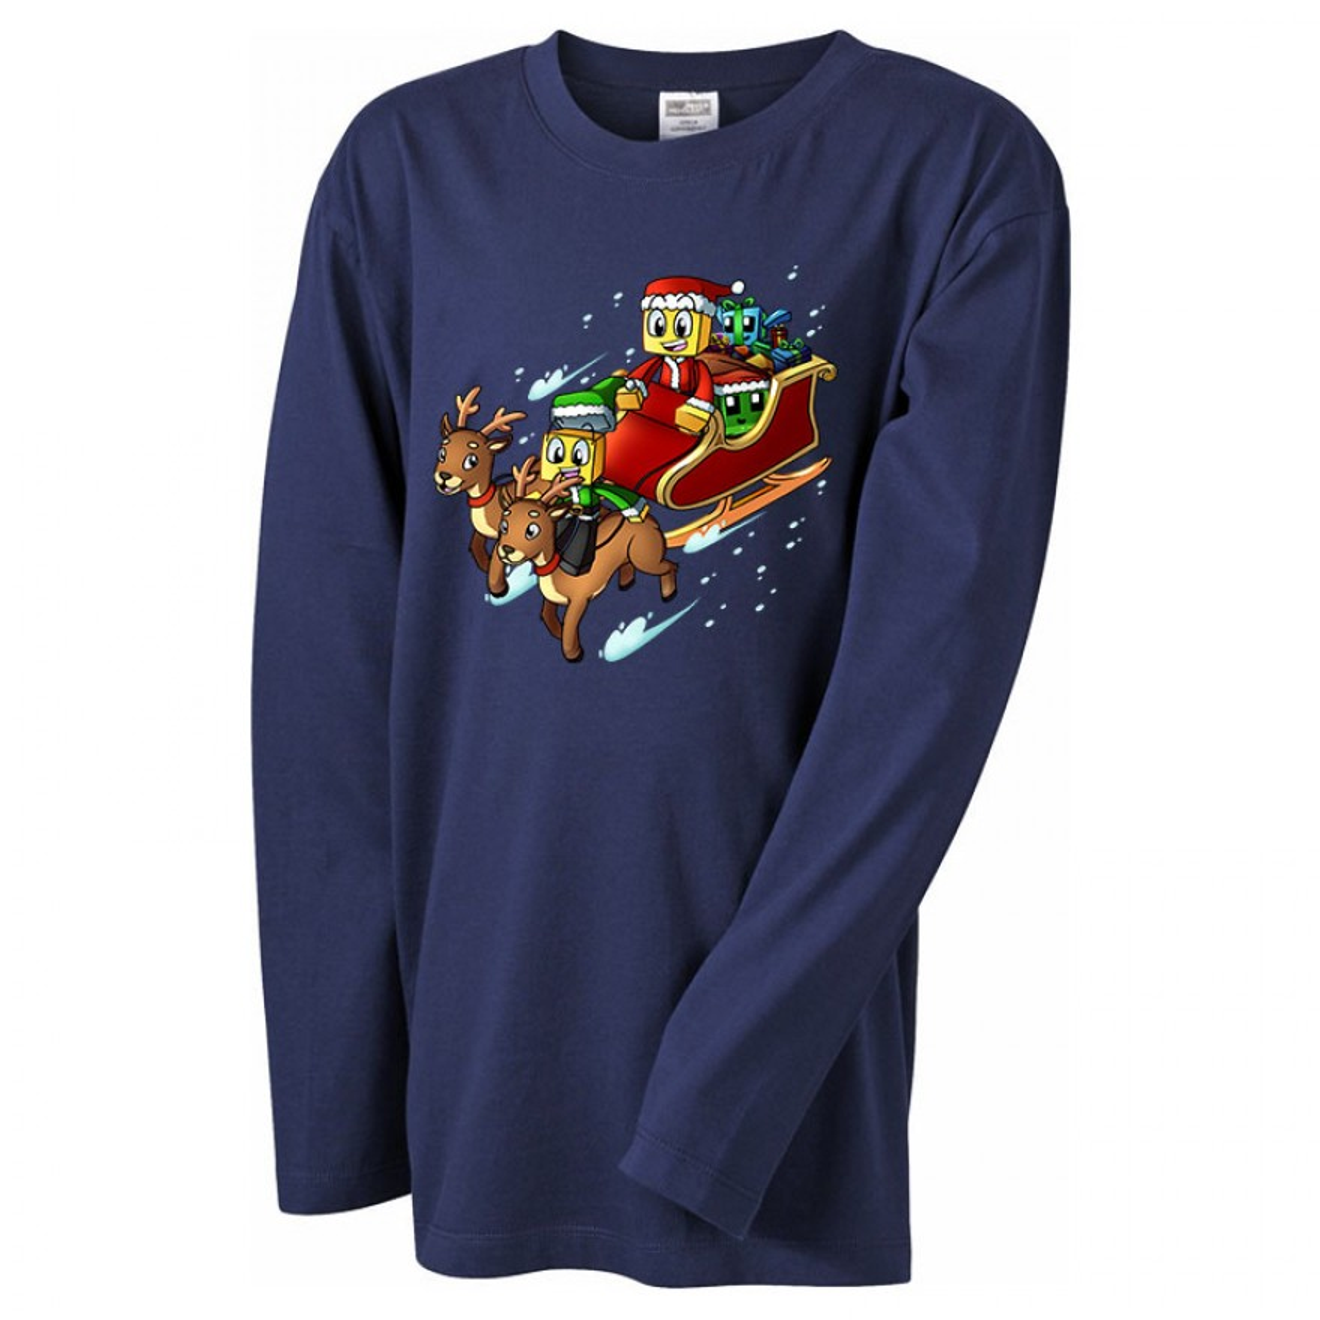 SCHLITTEN Weihnachts-Langarm-Shirt